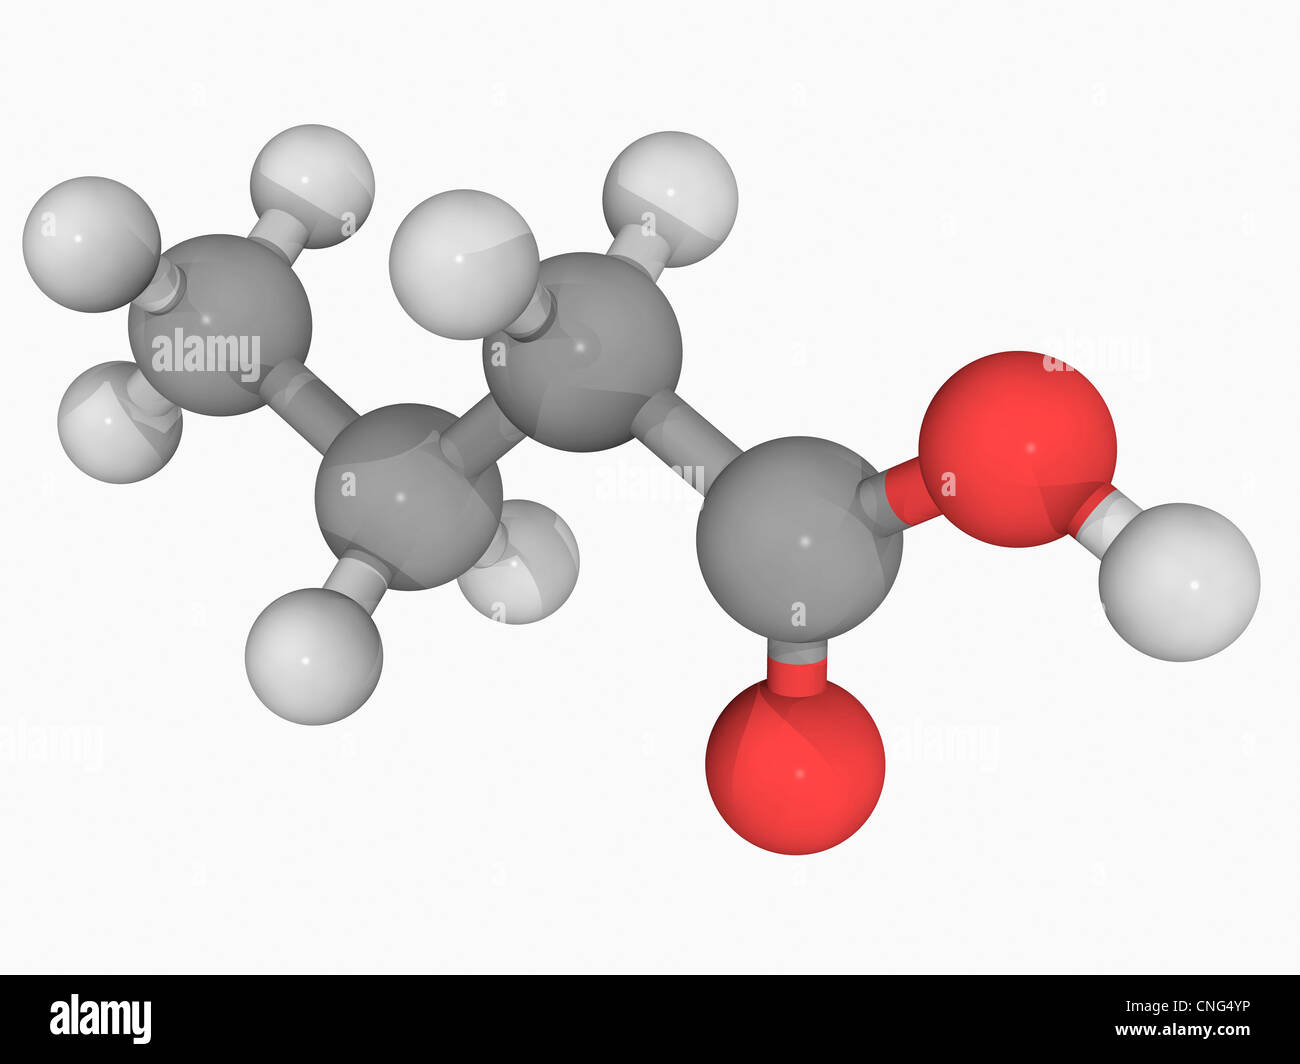 Butyric acid molecule - Stock Image